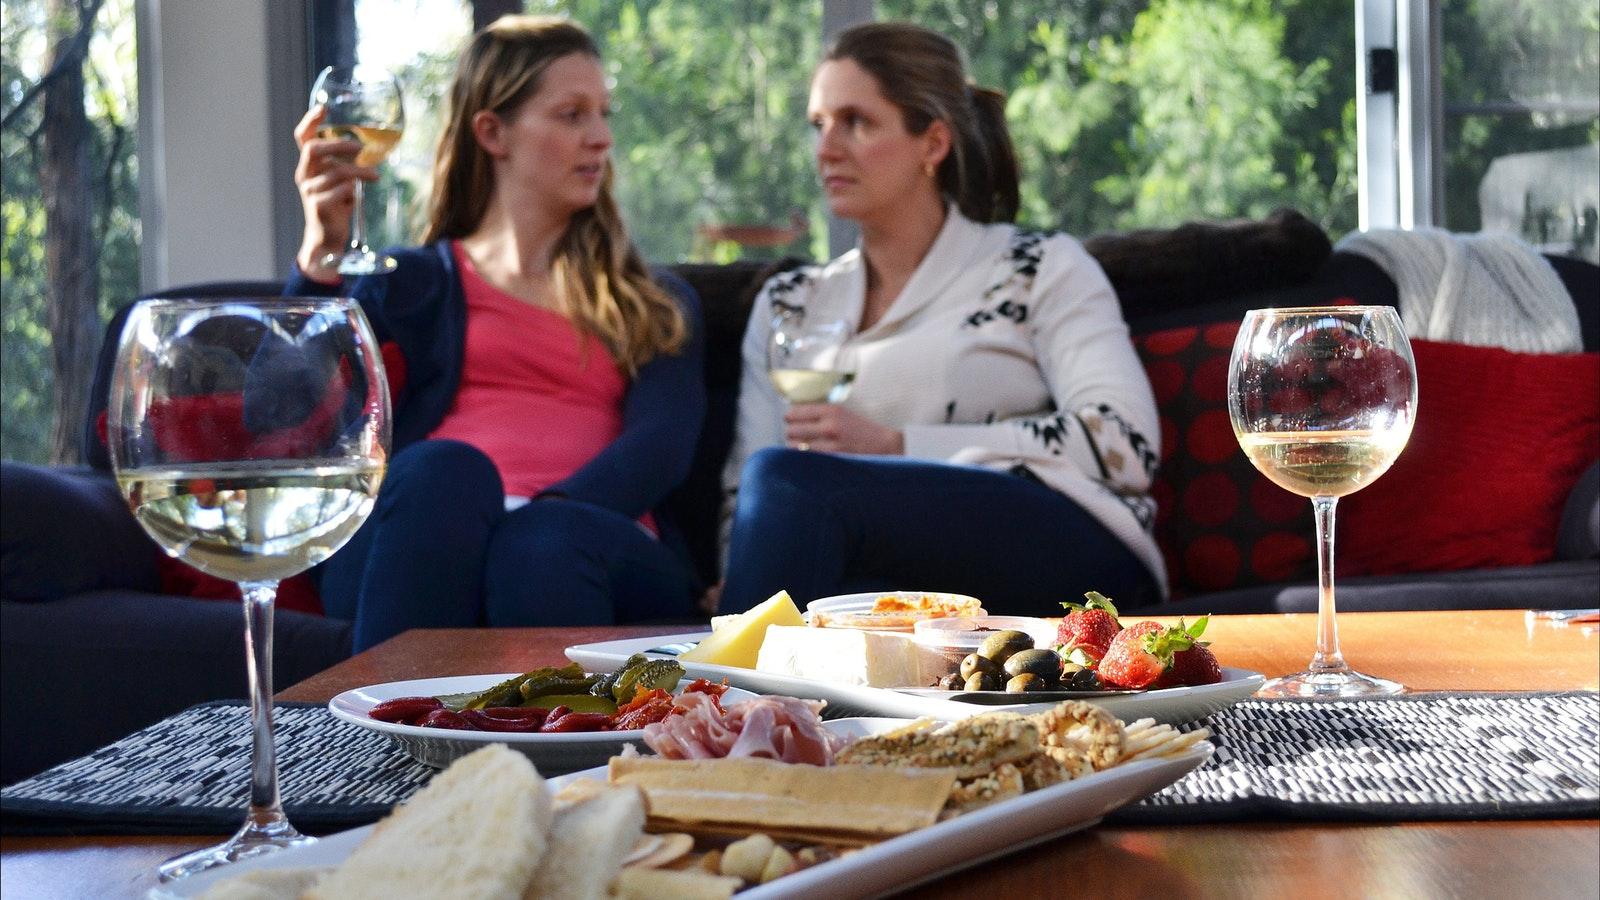 Wine time at Lakuna